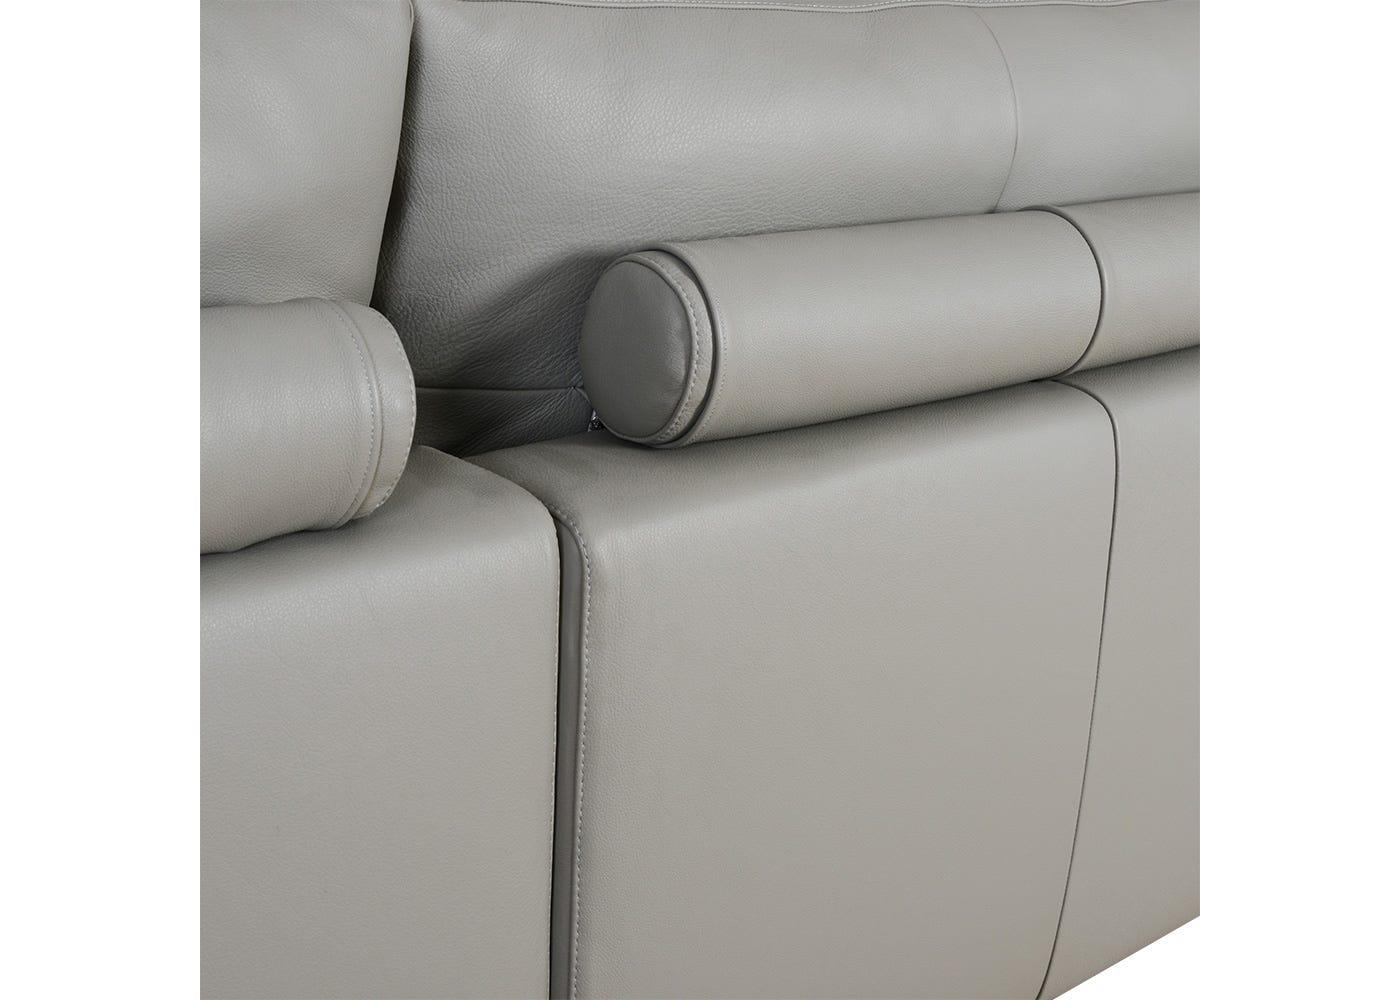 Amalfi Leather Sofa Images Domayne Sofa Bed Images  : mg0016535 from favefaves.com size 1400 x 1000 jpeg 201kB